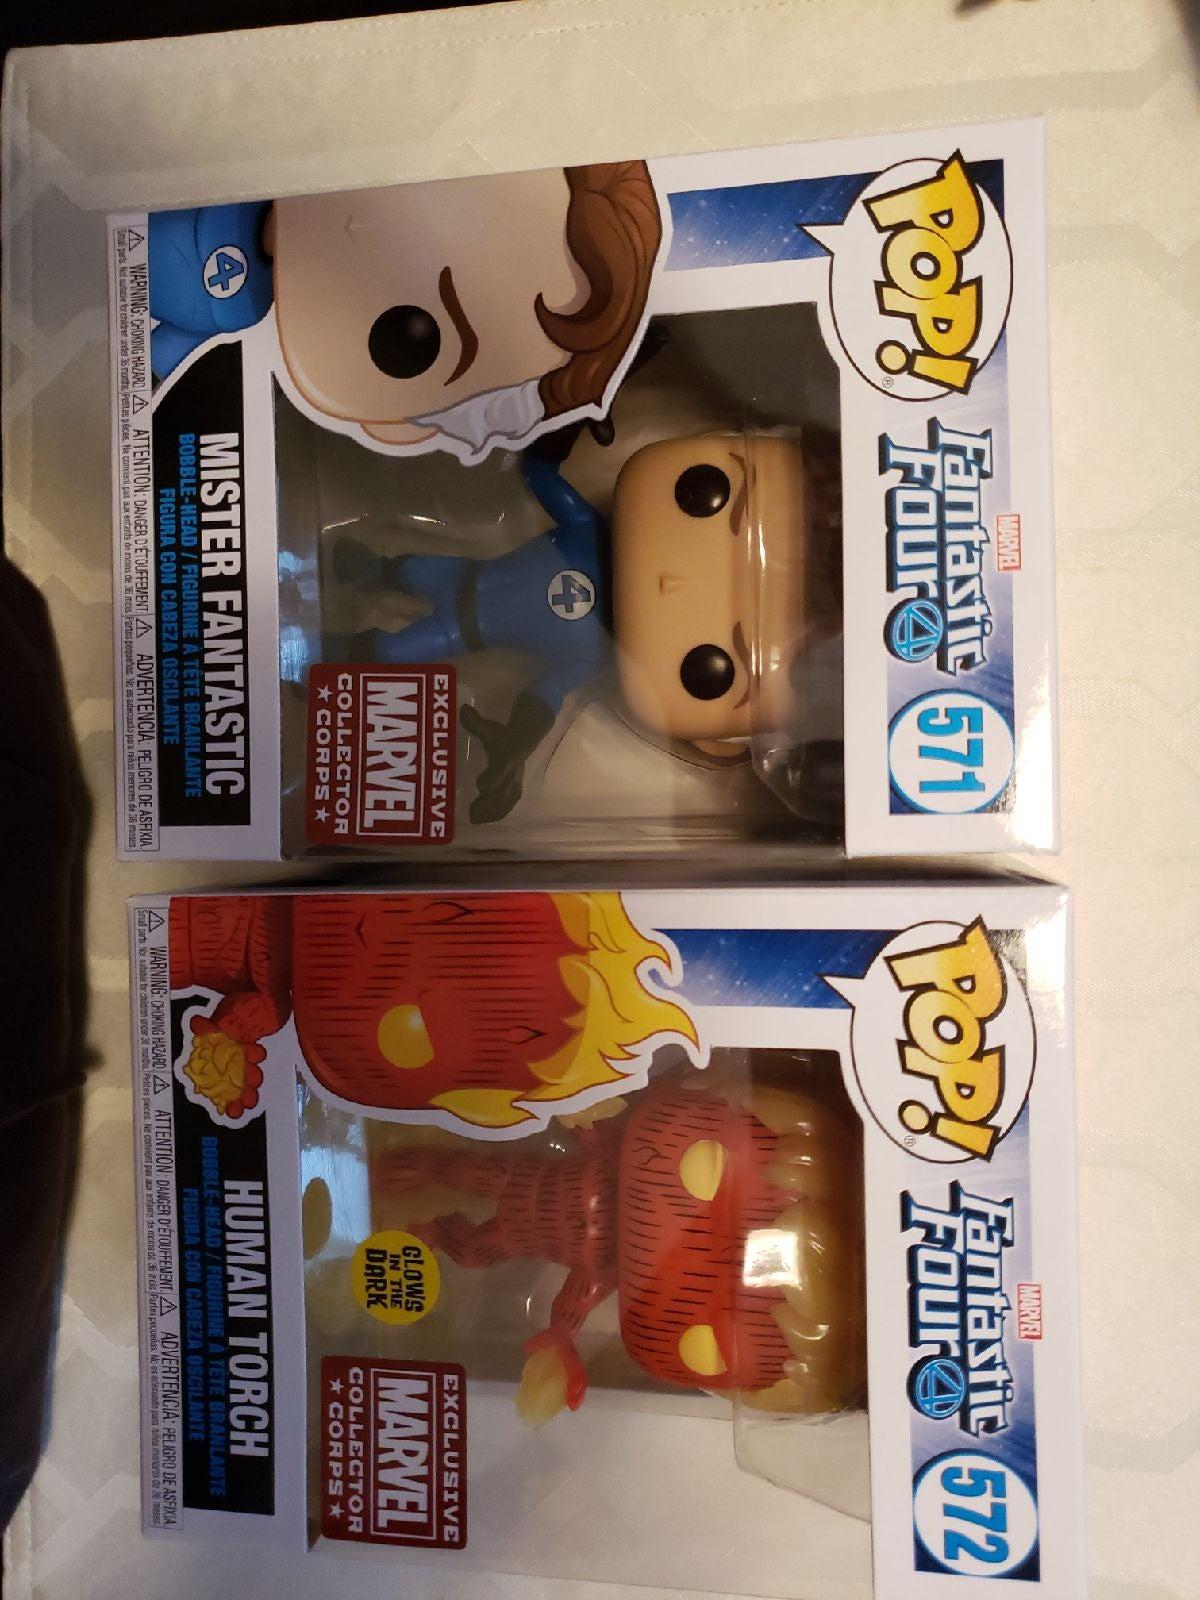 Fantastic Four pops